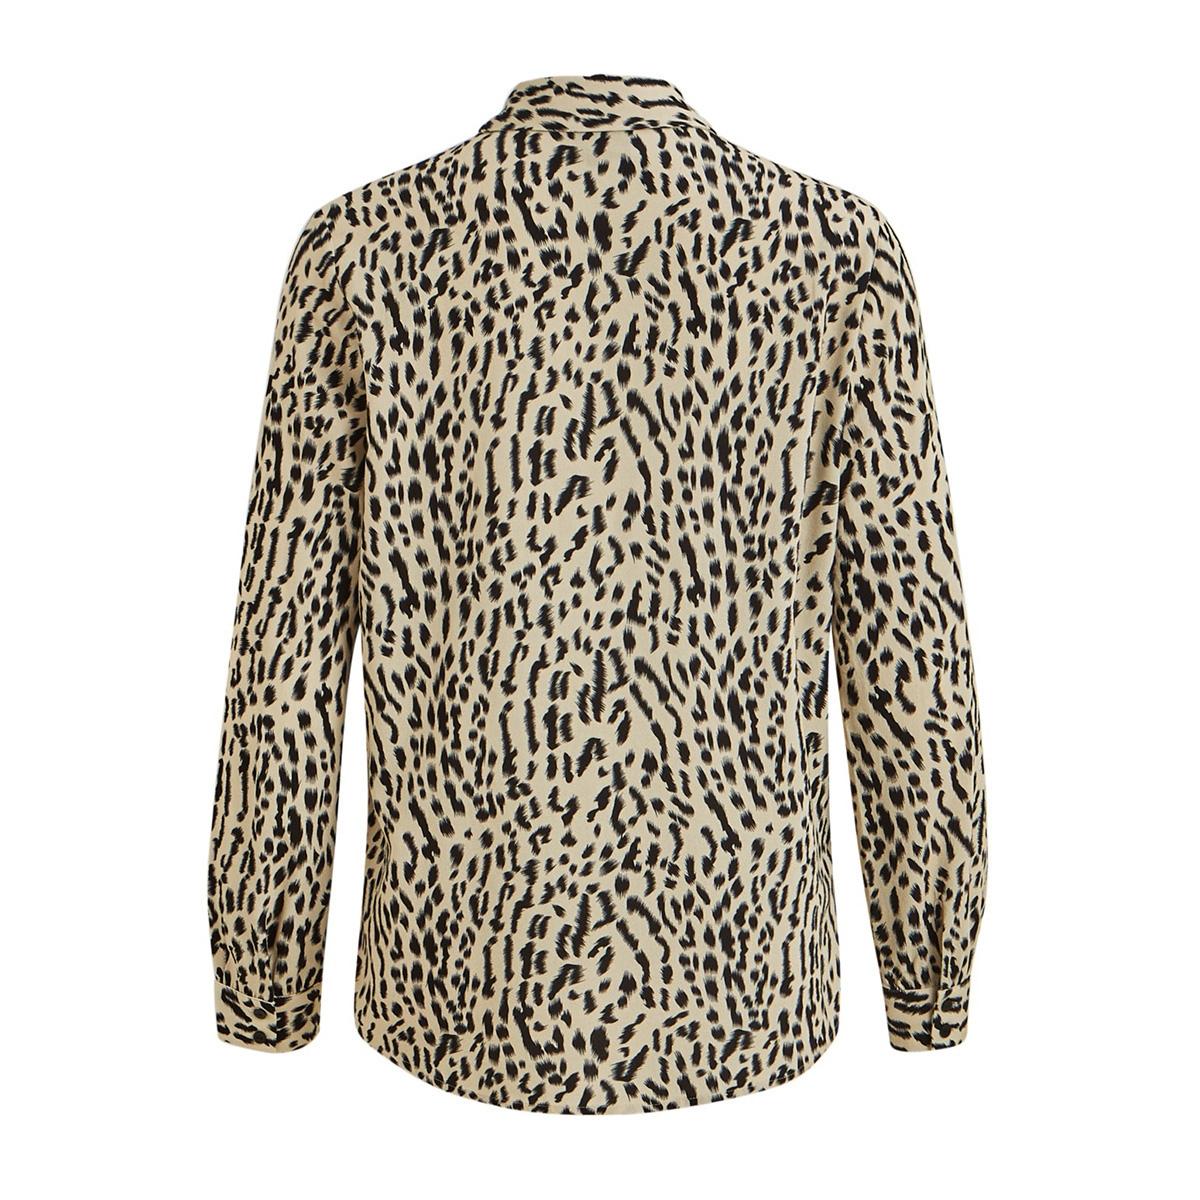 objbay l/s shirt aop seasonal 23030925 object blouse humus/new animal